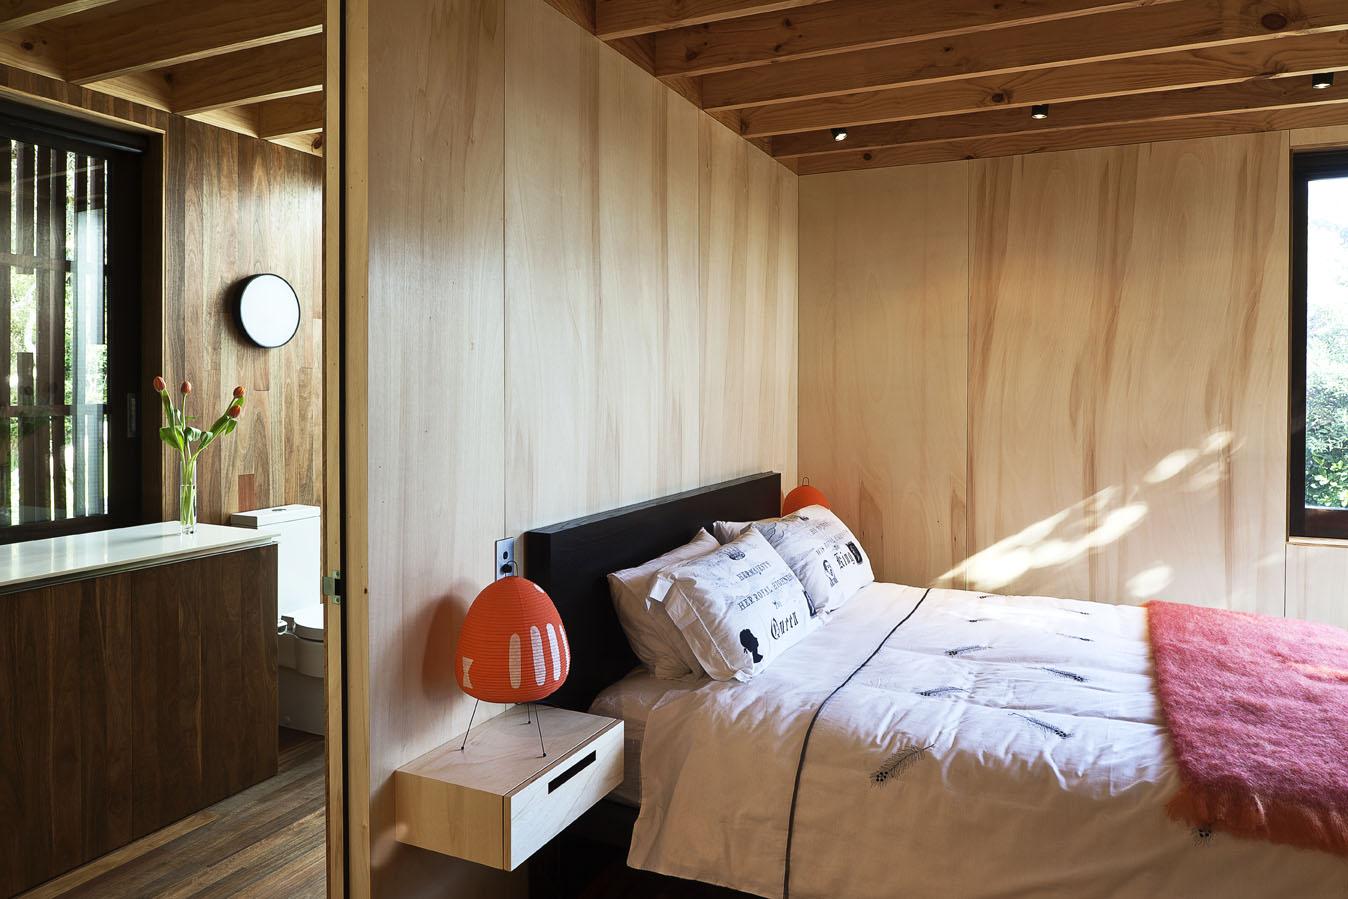 wooden-raw-exposed-modern-bedroom-interior-stylish-inspiration12